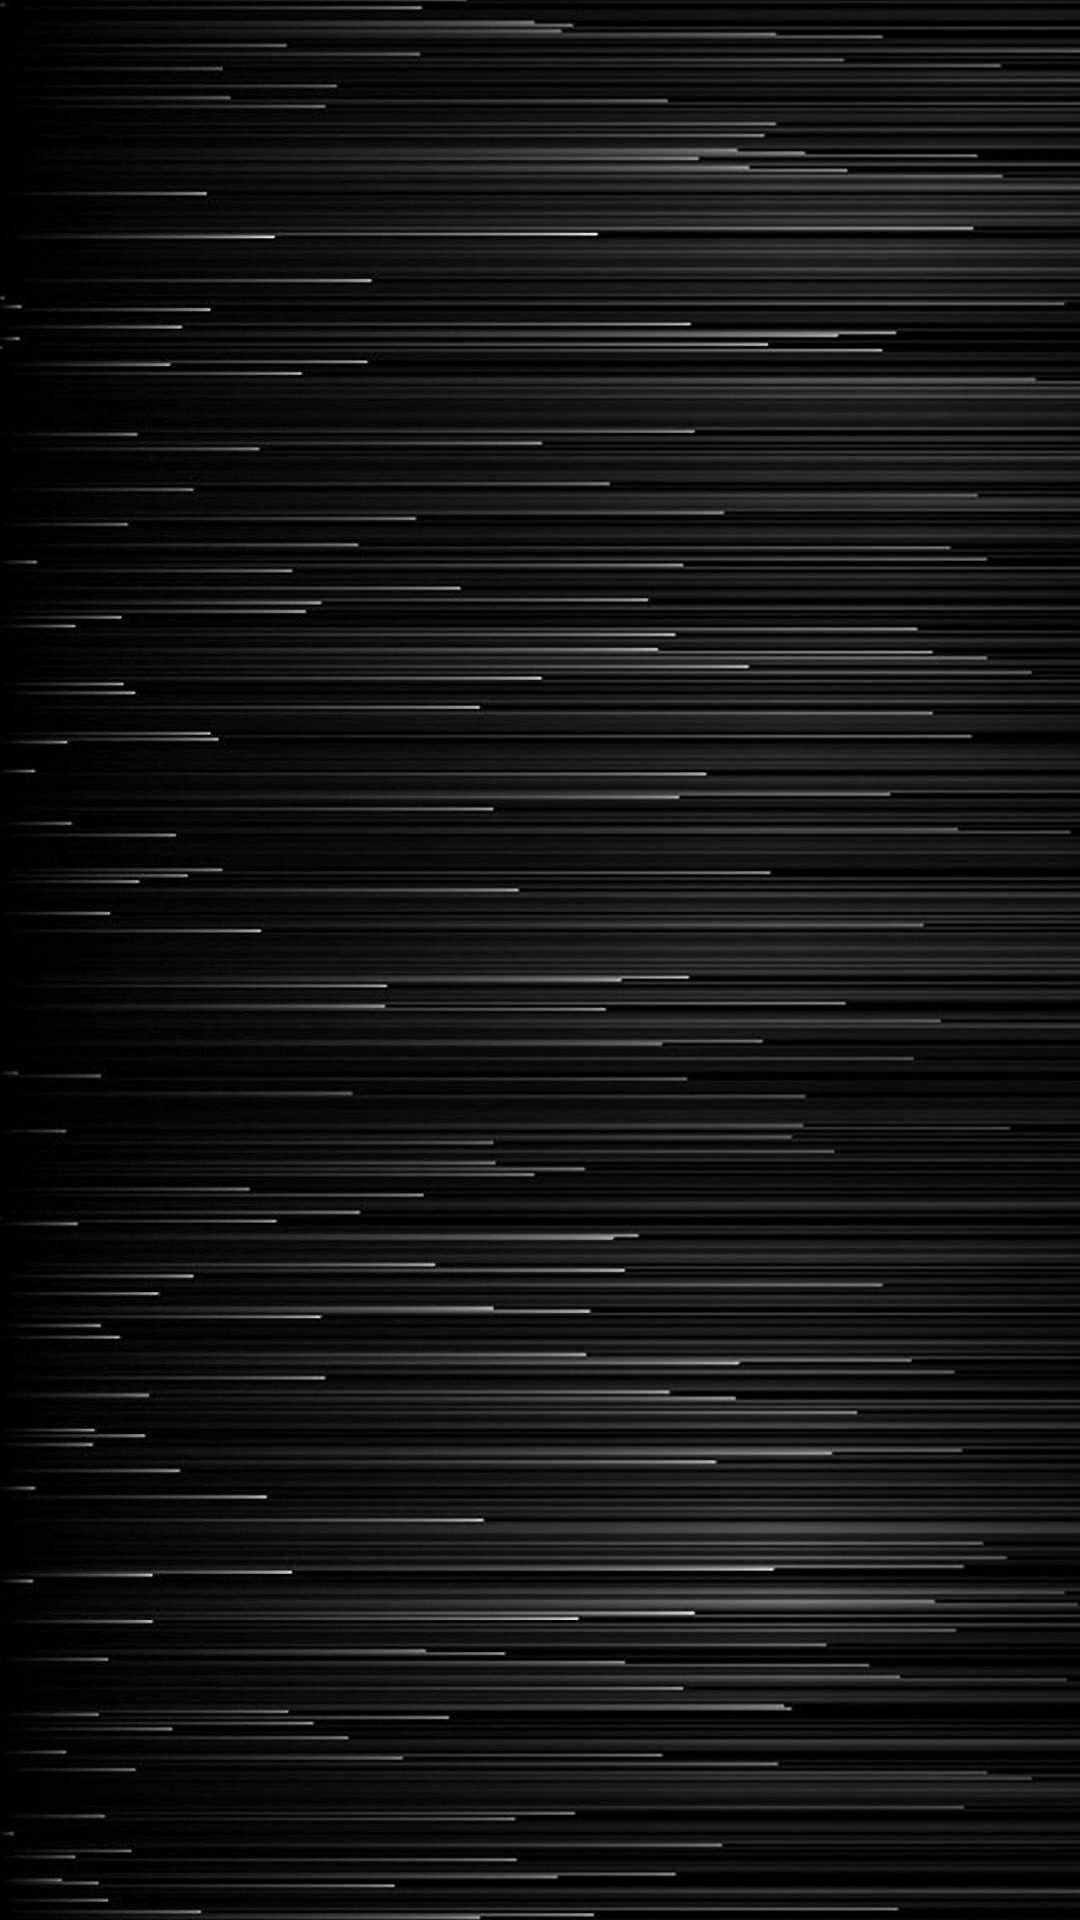 Pin By Iyan Sofyan On Material Minimal Pattern Hd Phone Wallpapers Dark Phone Wallpapers Dark Wallpaper